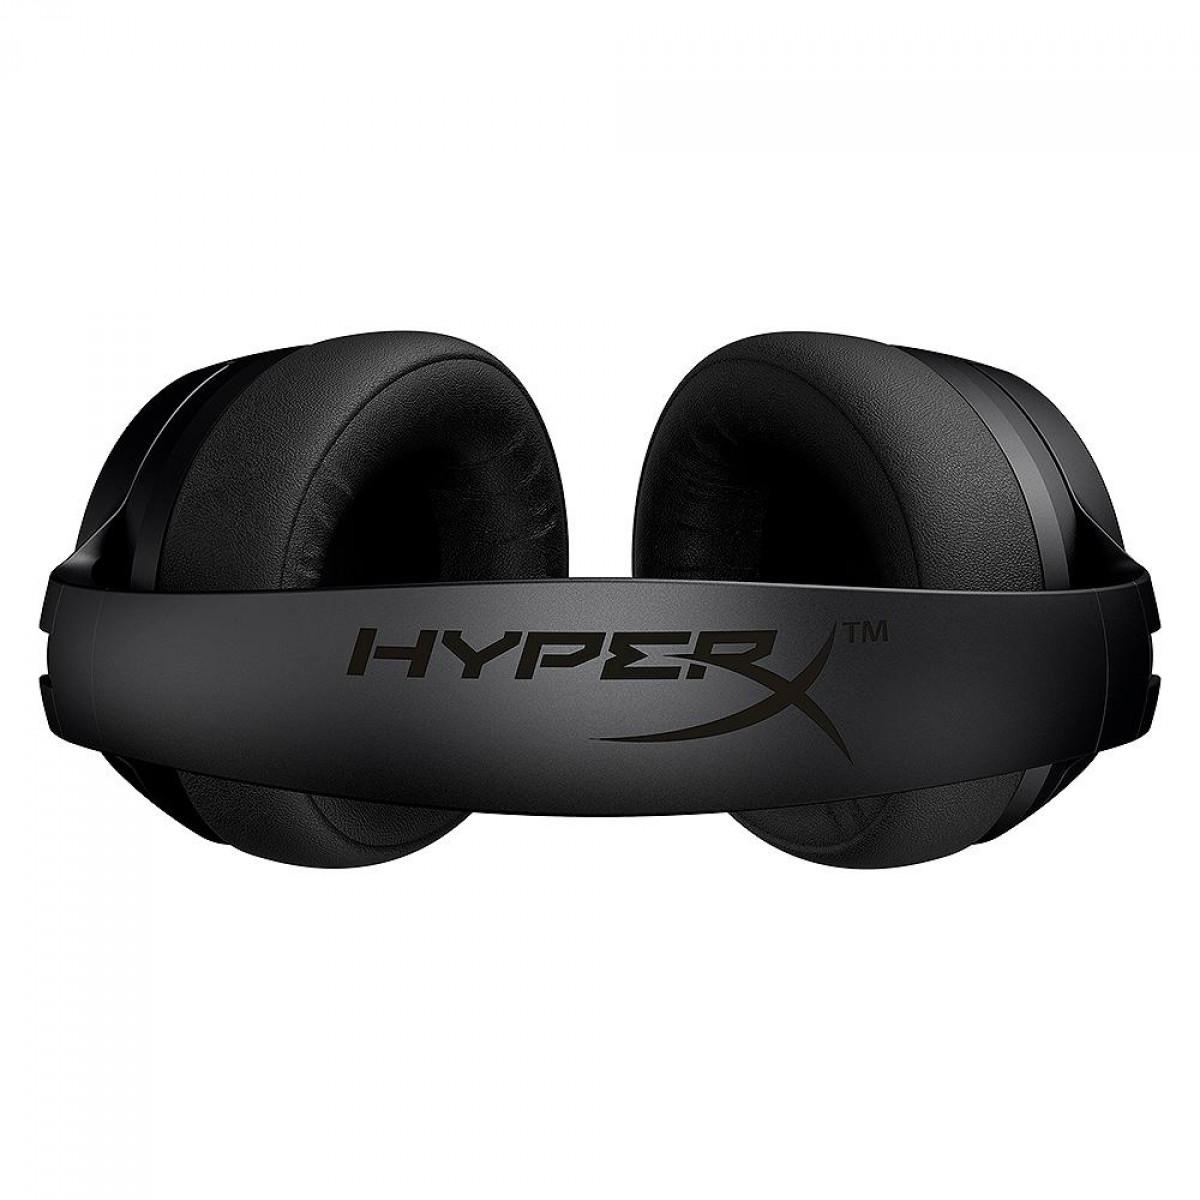 Headset Gamer Sem Fio HyperX Cloud Flight S, Drivers 50mm, Surround 7.1, Carregamento QI, Múltiplas Plataformas, HX-HSCFS-SG/WW